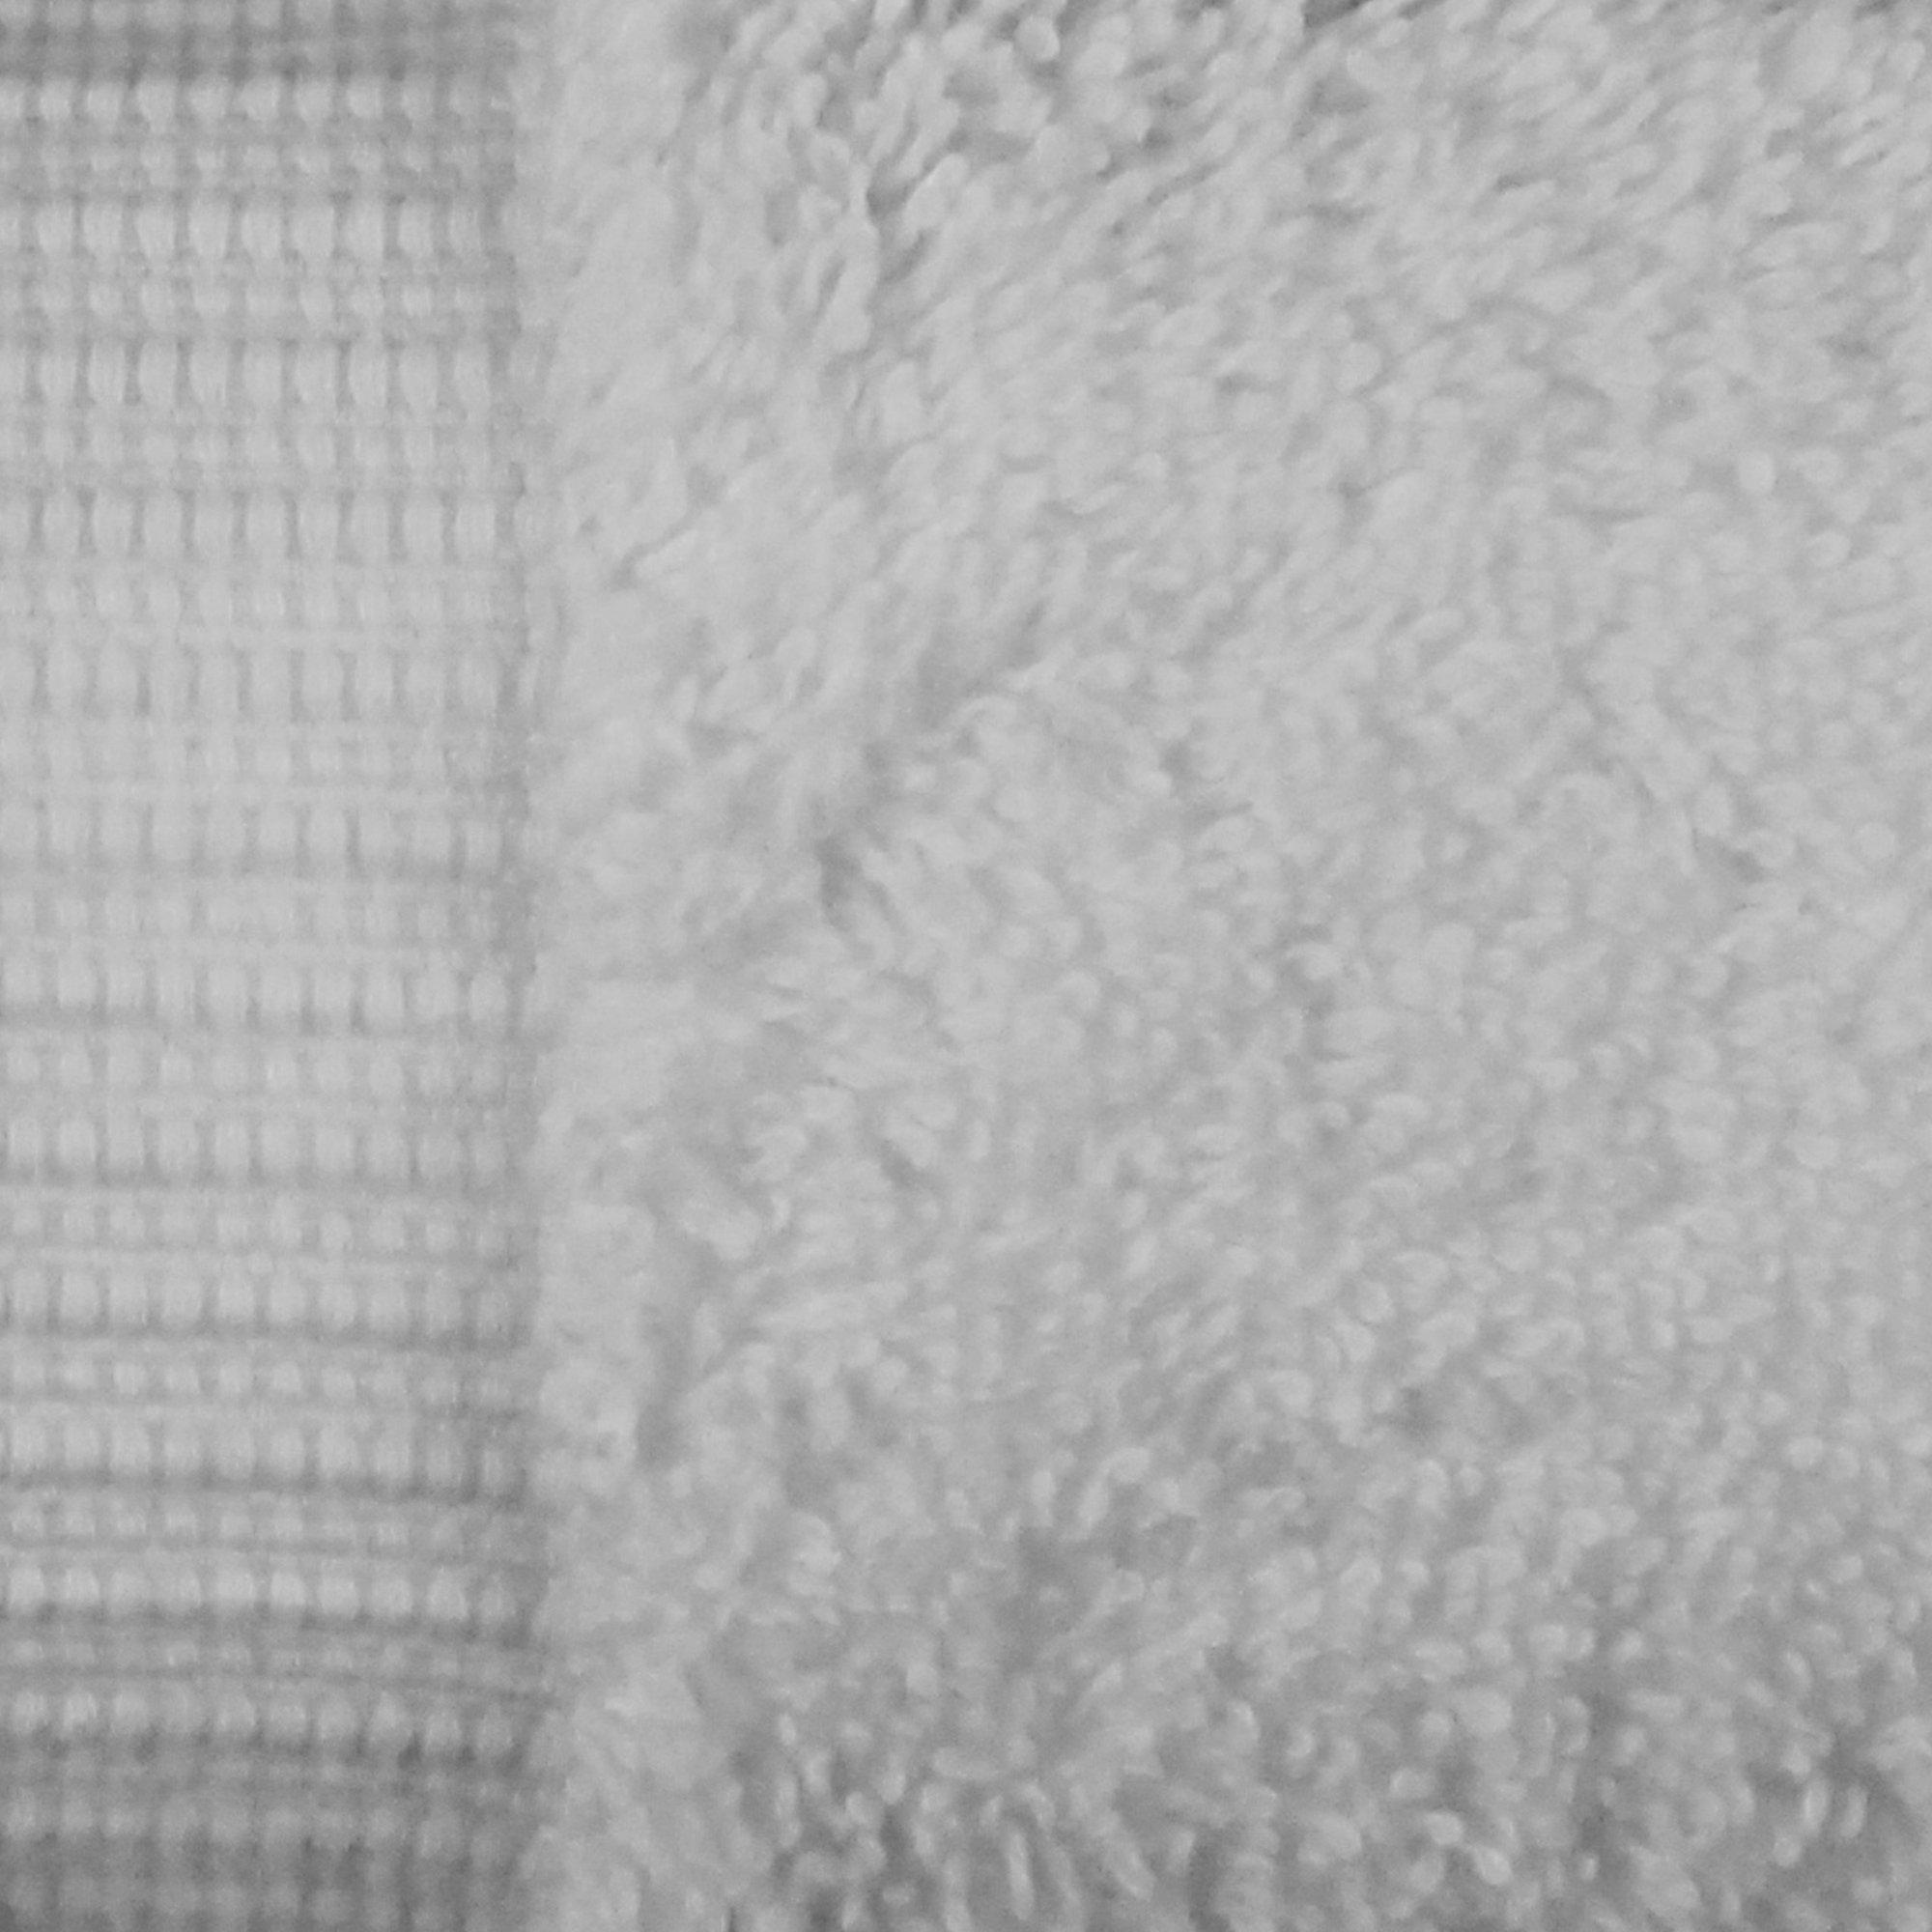 Luxury Hotel & Spa Towel 100% Genuine Turkish Cotton (White, Hand Towel - Set of 6) by Chakir Turkish Linens (Image #2)